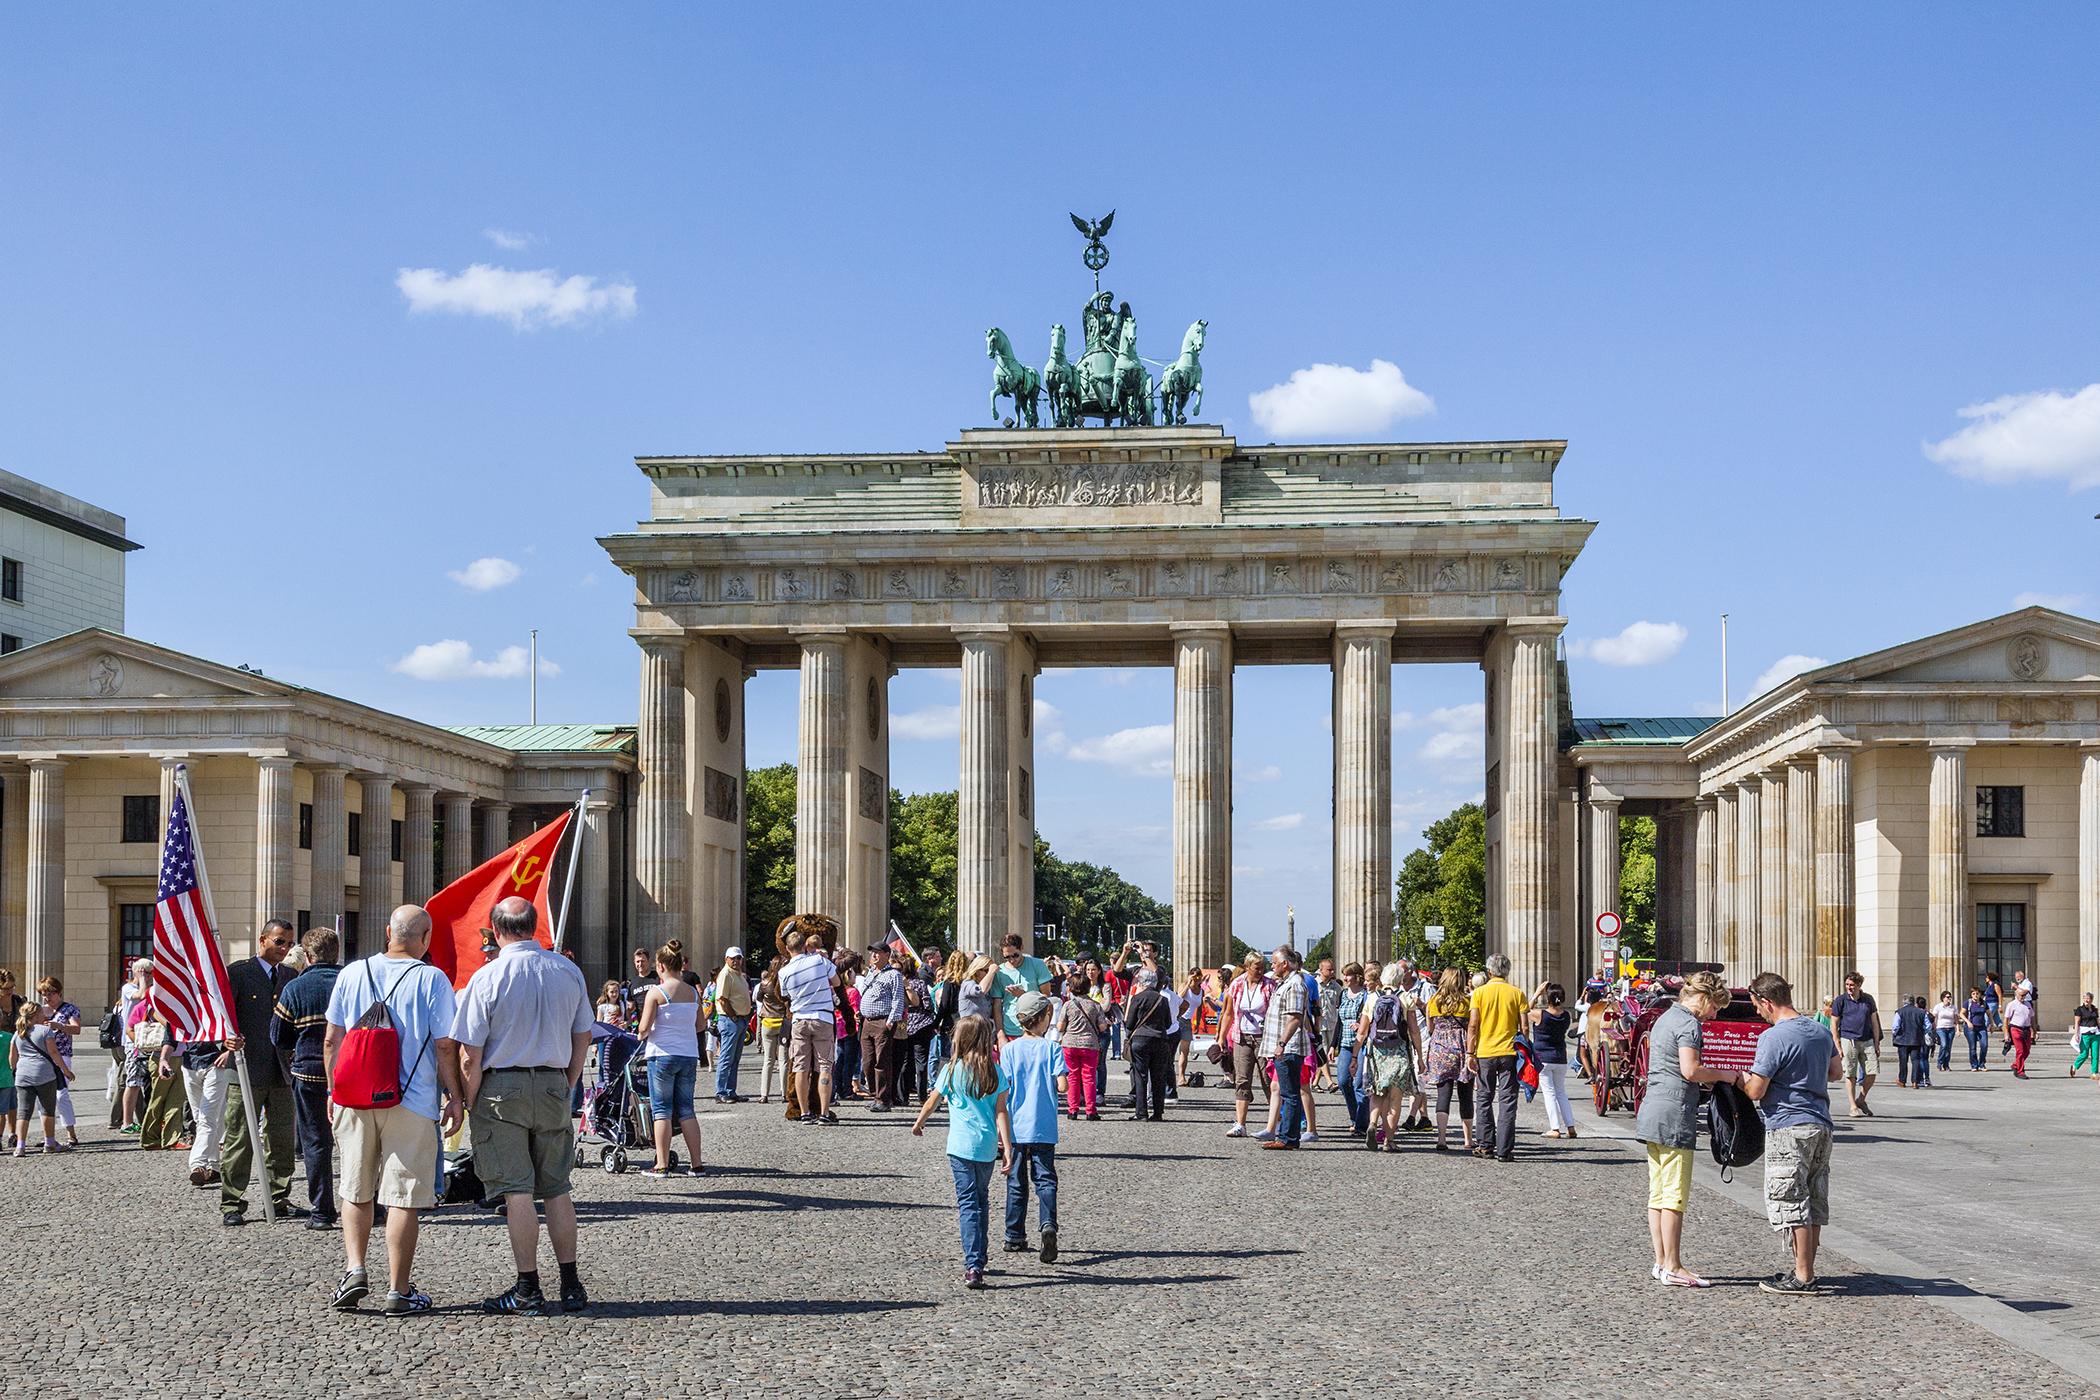 170407-europe-travel-berlin